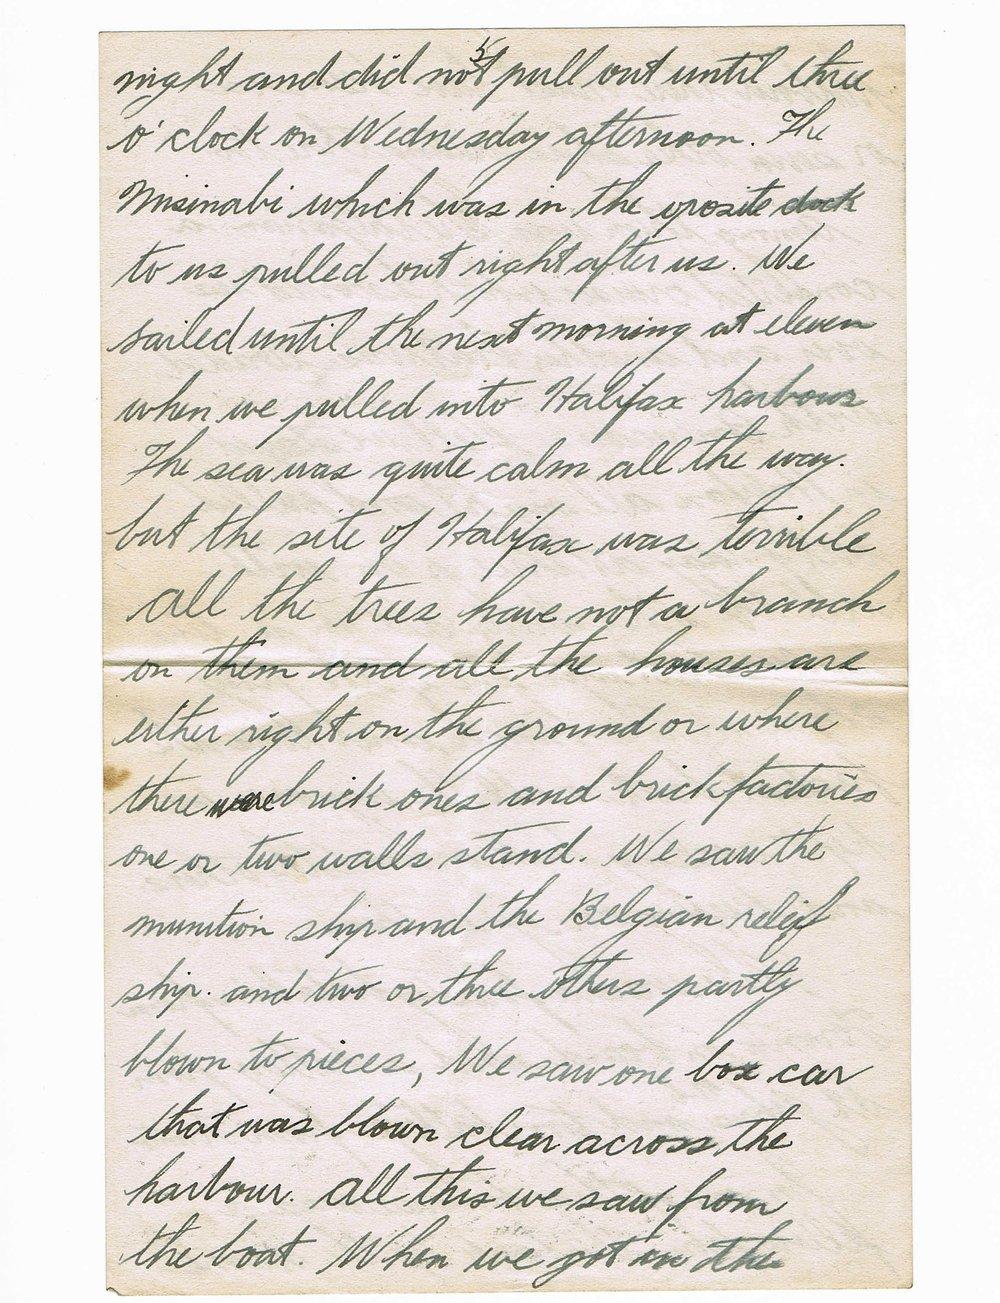 Basil Vale January 2, 1918 letter - page 5.jpg